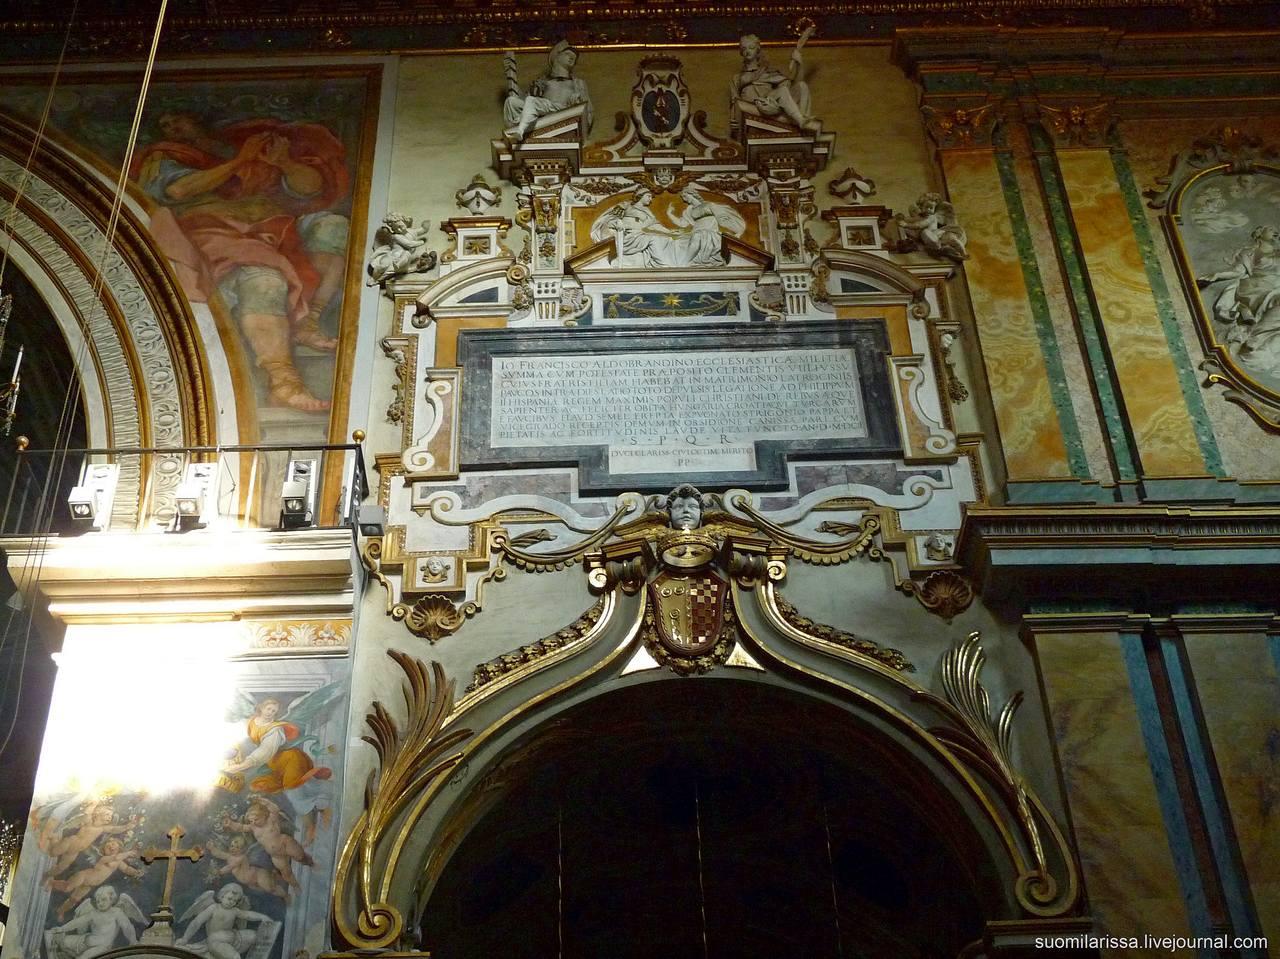 Chiesa S. Maria in Aracoeli (2)